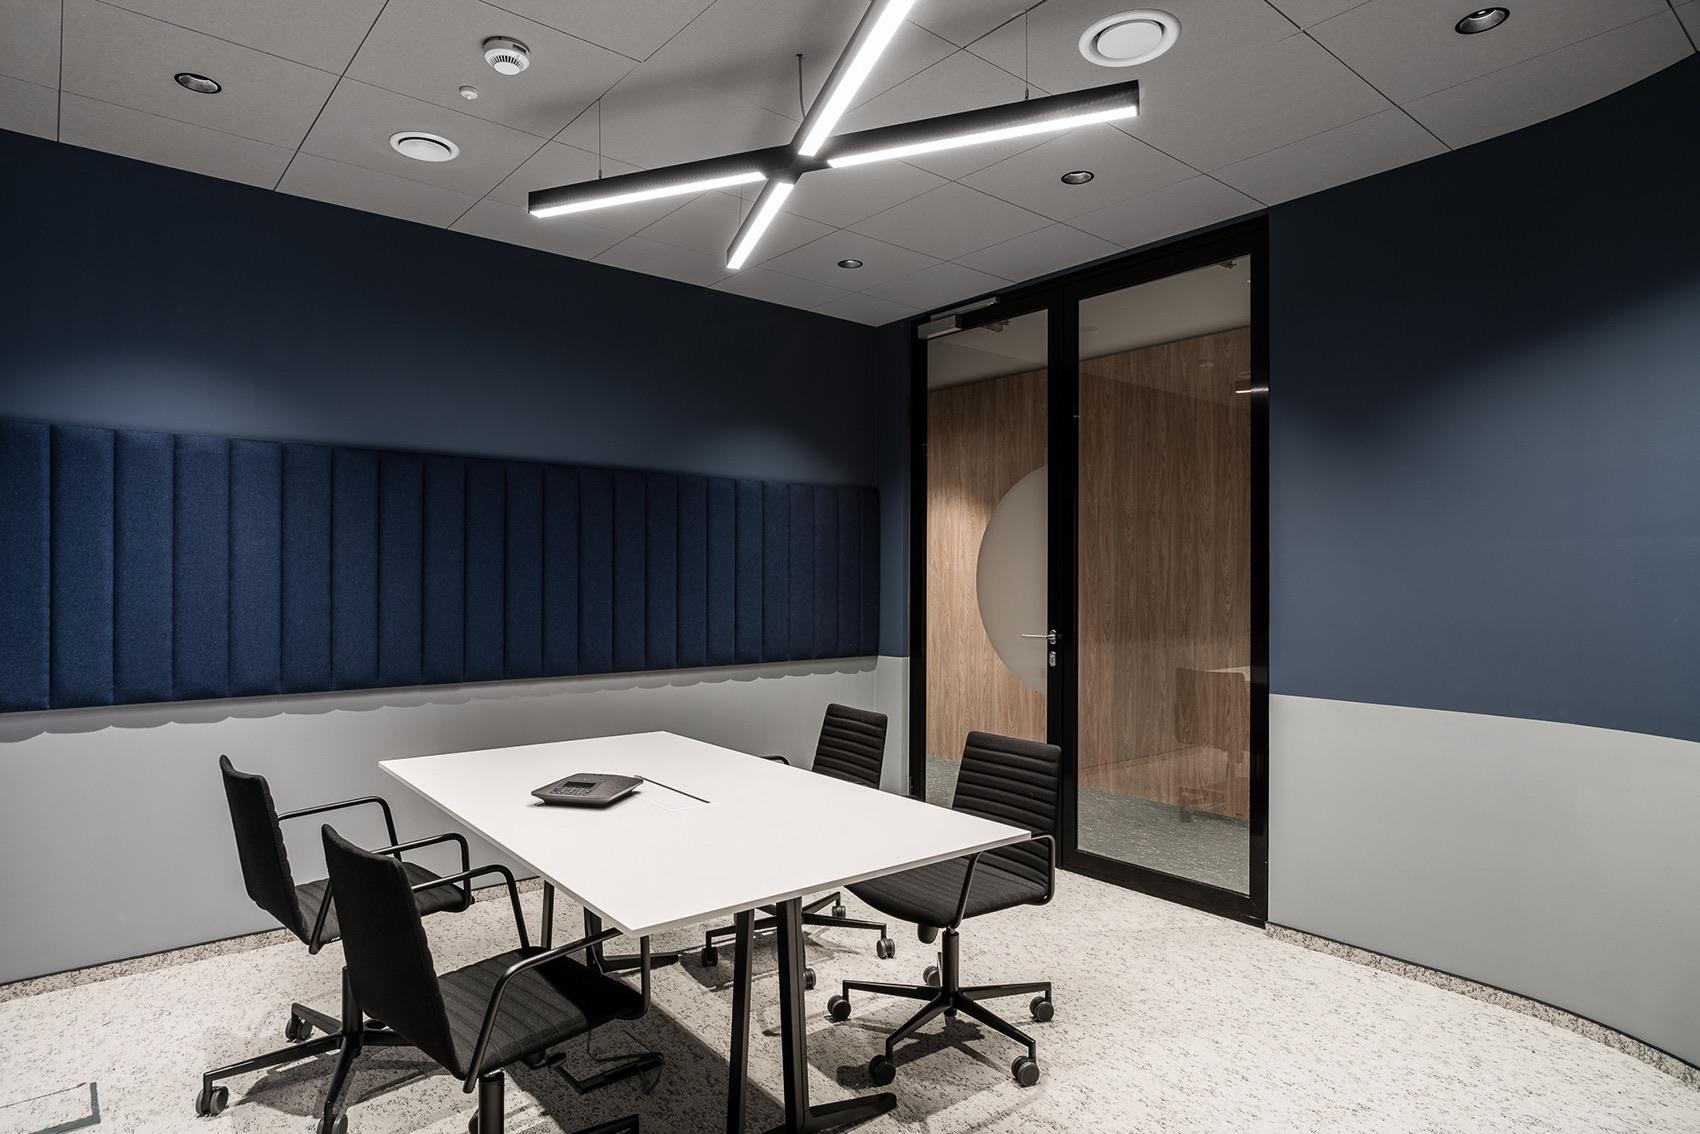 santander-office-lublin-17